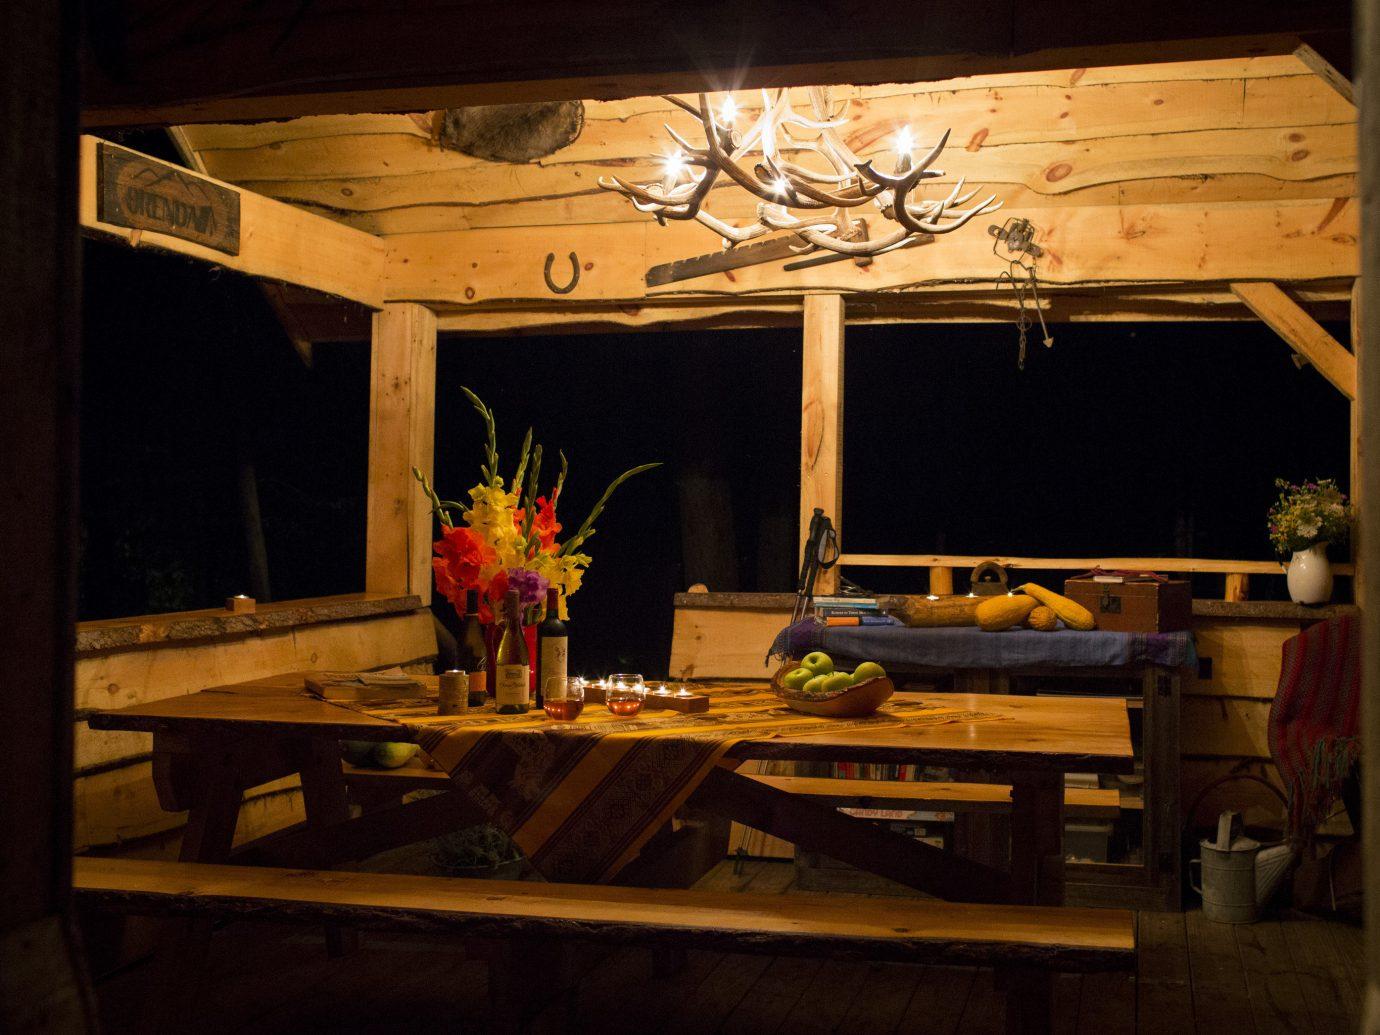 Glamping Outdoors + Adventure Weekend Getaways indoor table building room wood furniture home interior design window house restaurant night Fireplace dark